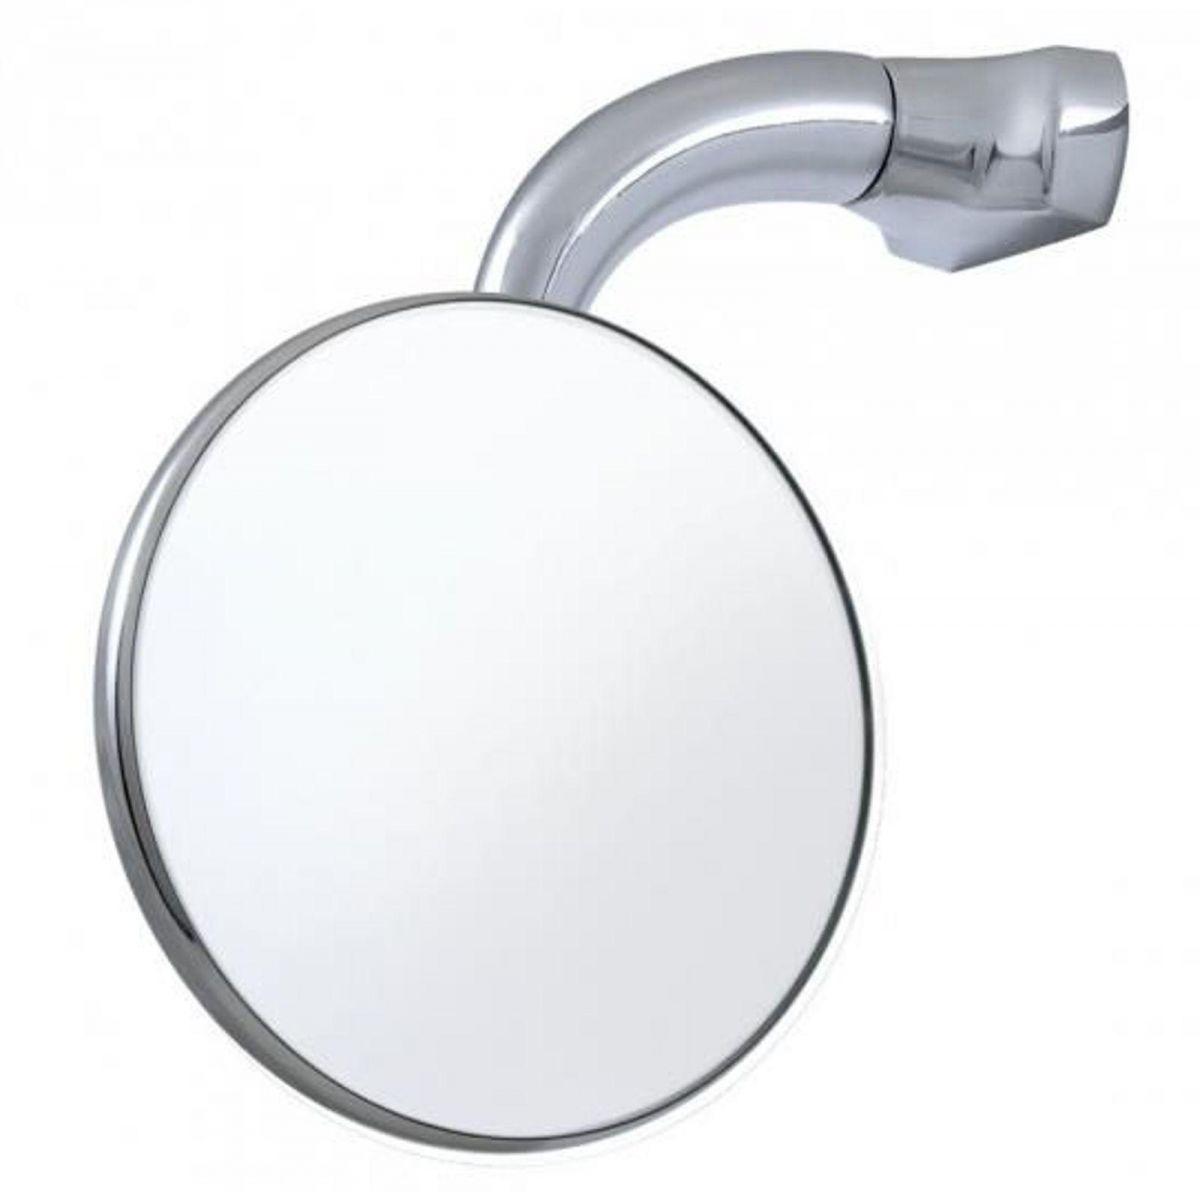 Espelho Retrovisor Universal 4´ Haste Curta